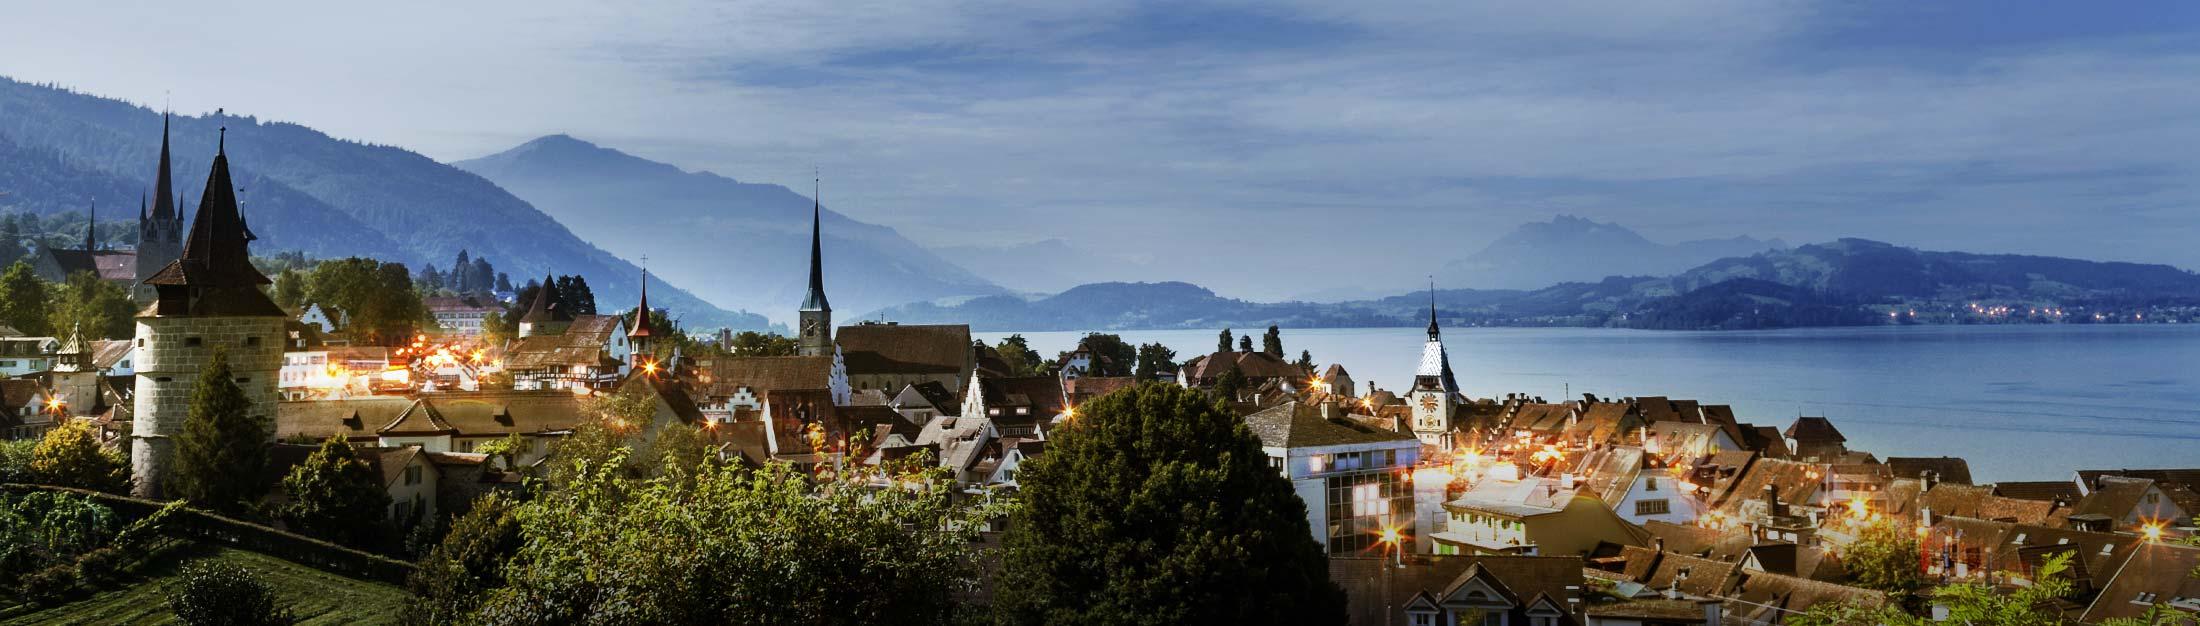 suisse-azurexpat